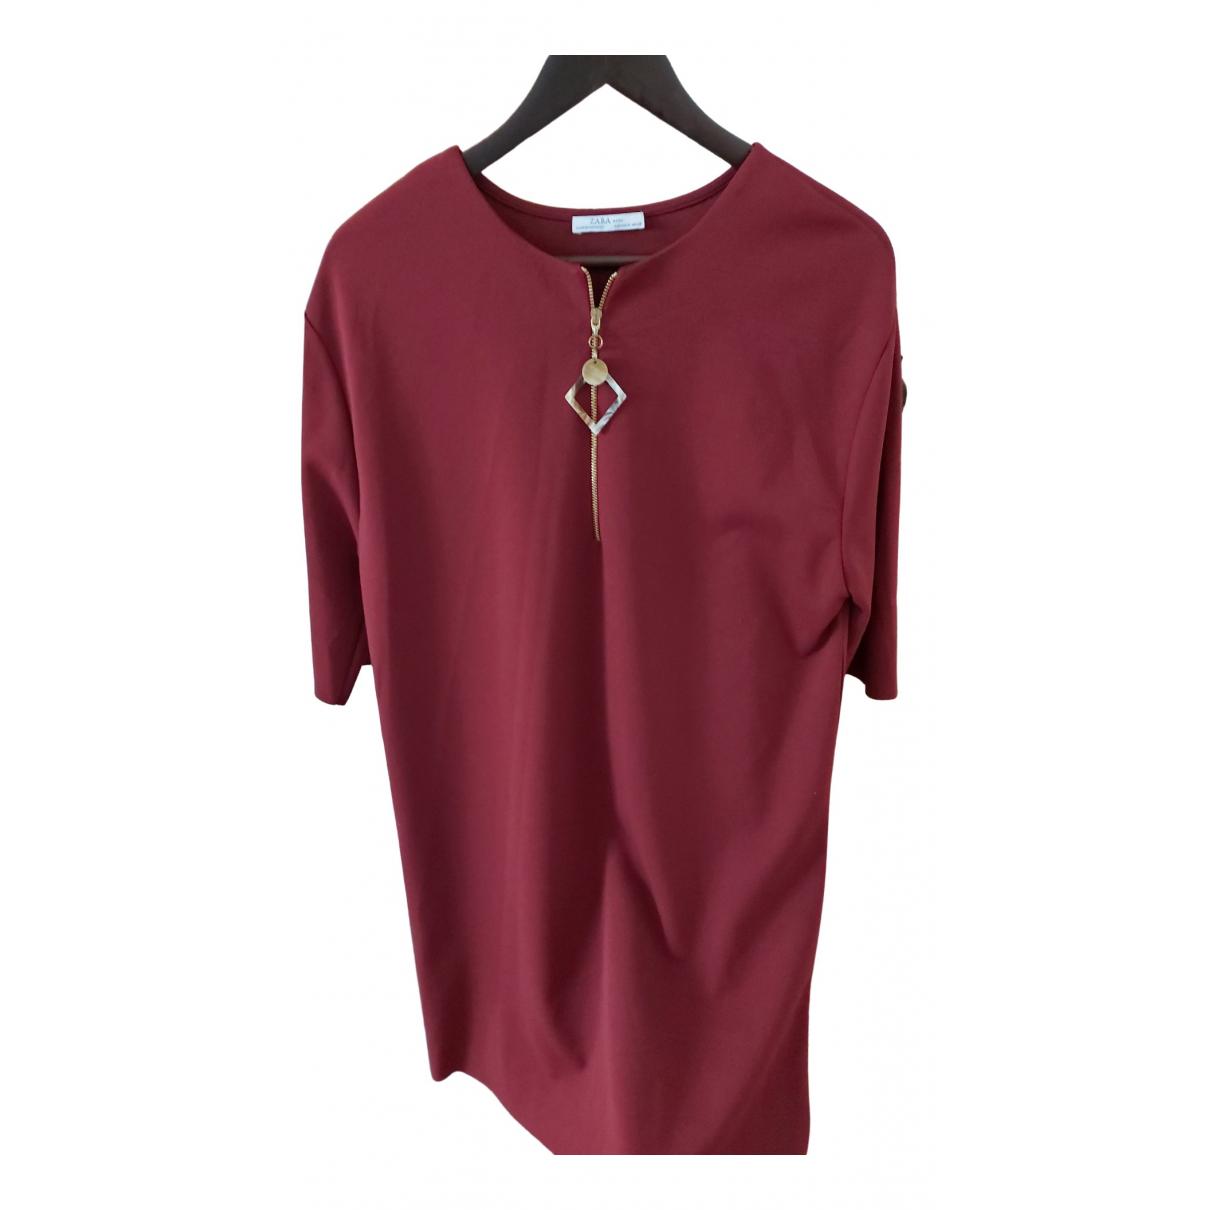 Zara \N Burgundy Cotton dress for Women 38 FR